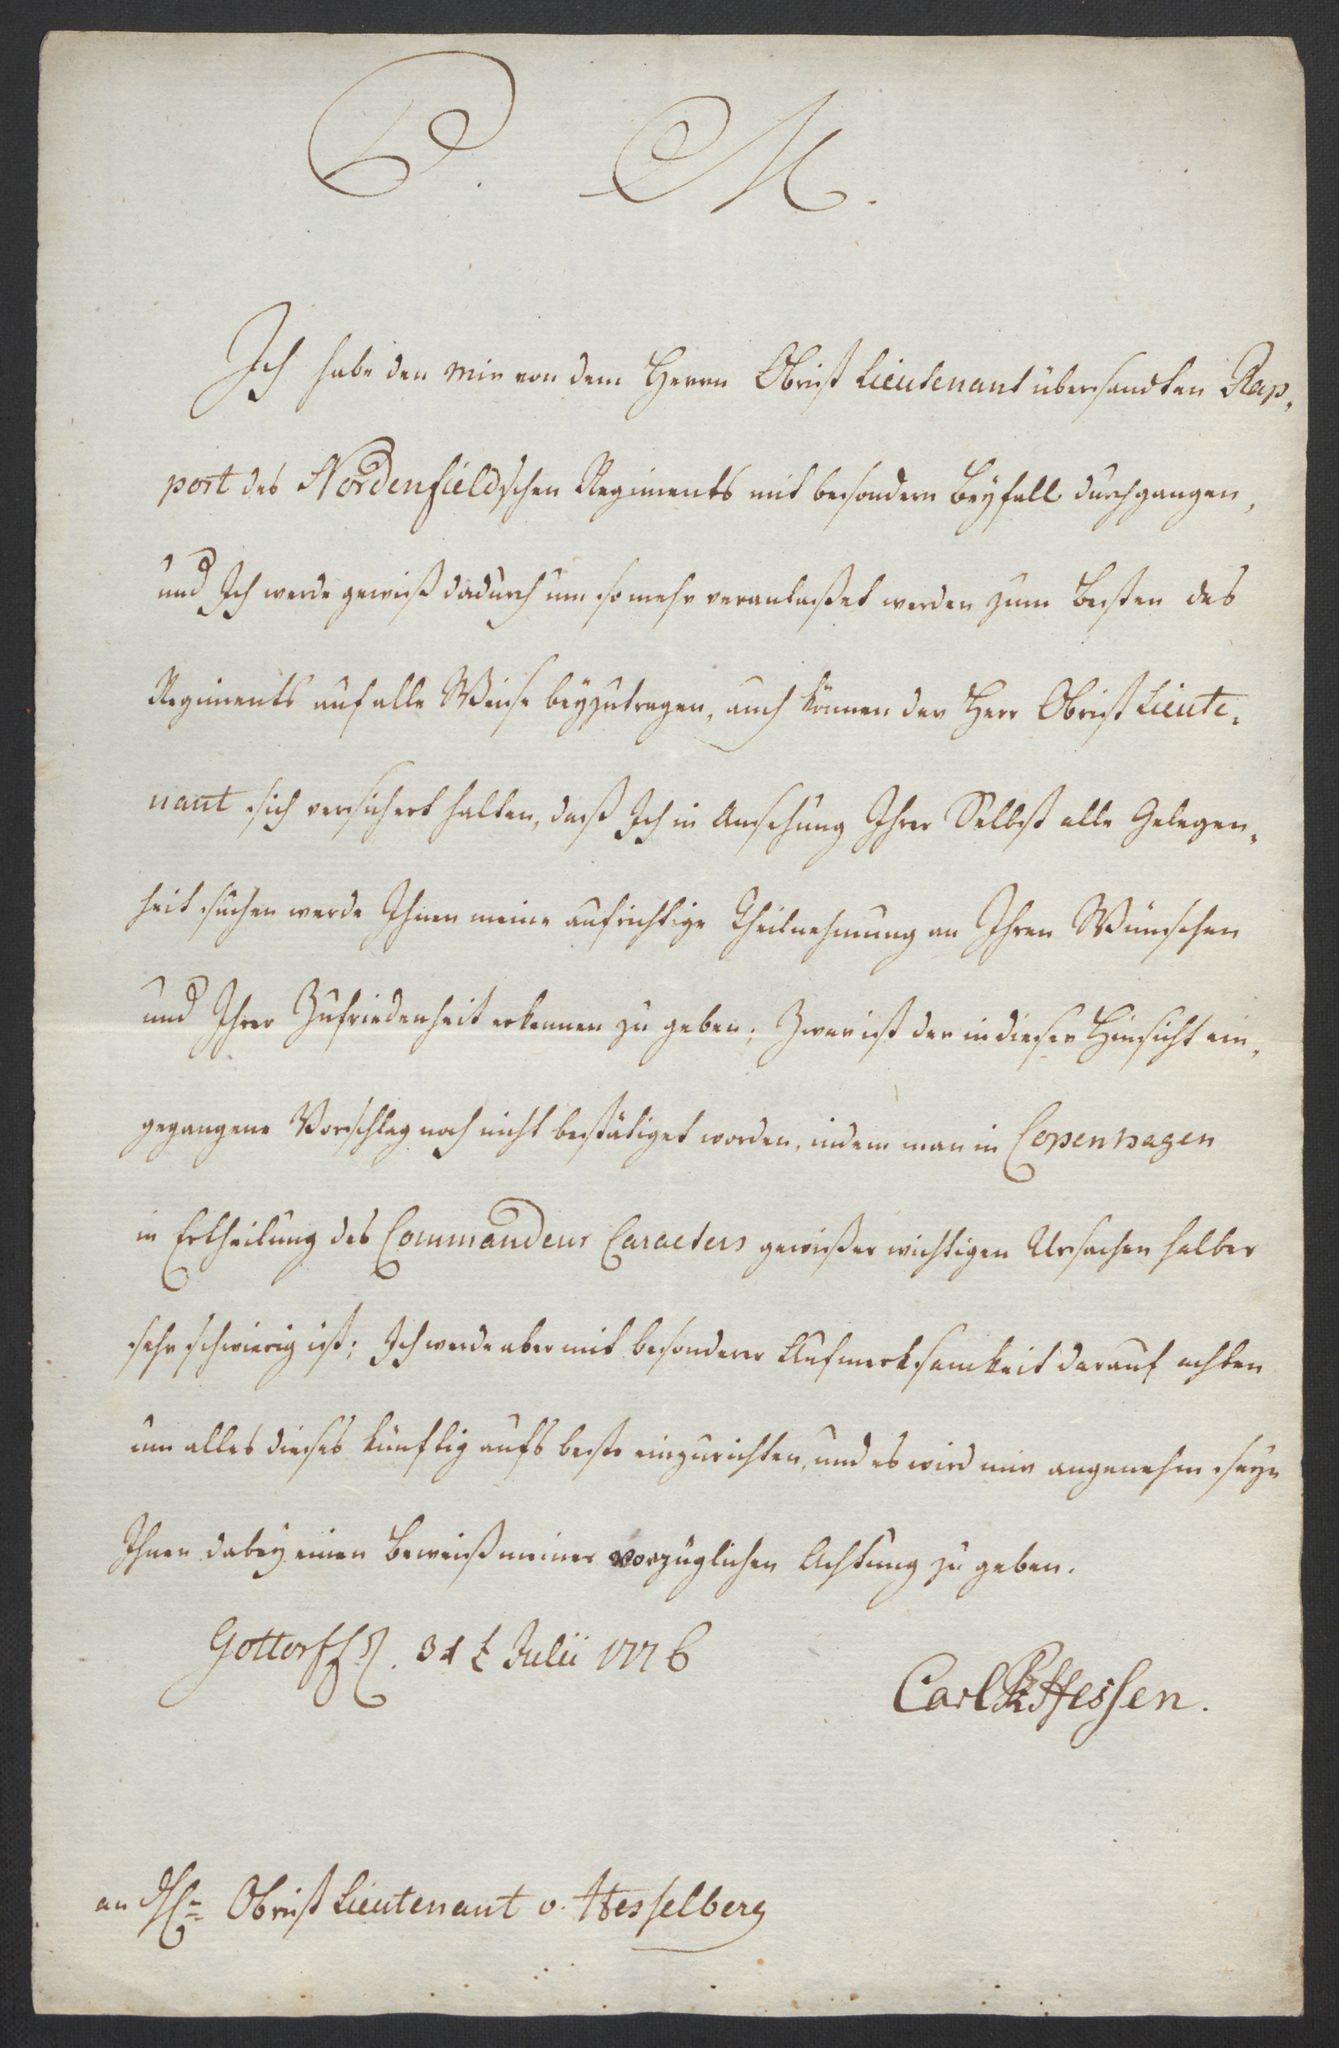 RA, Hesselberg, Hans Jacob Henning, F/L0001: --, 1759-1809, p. 79